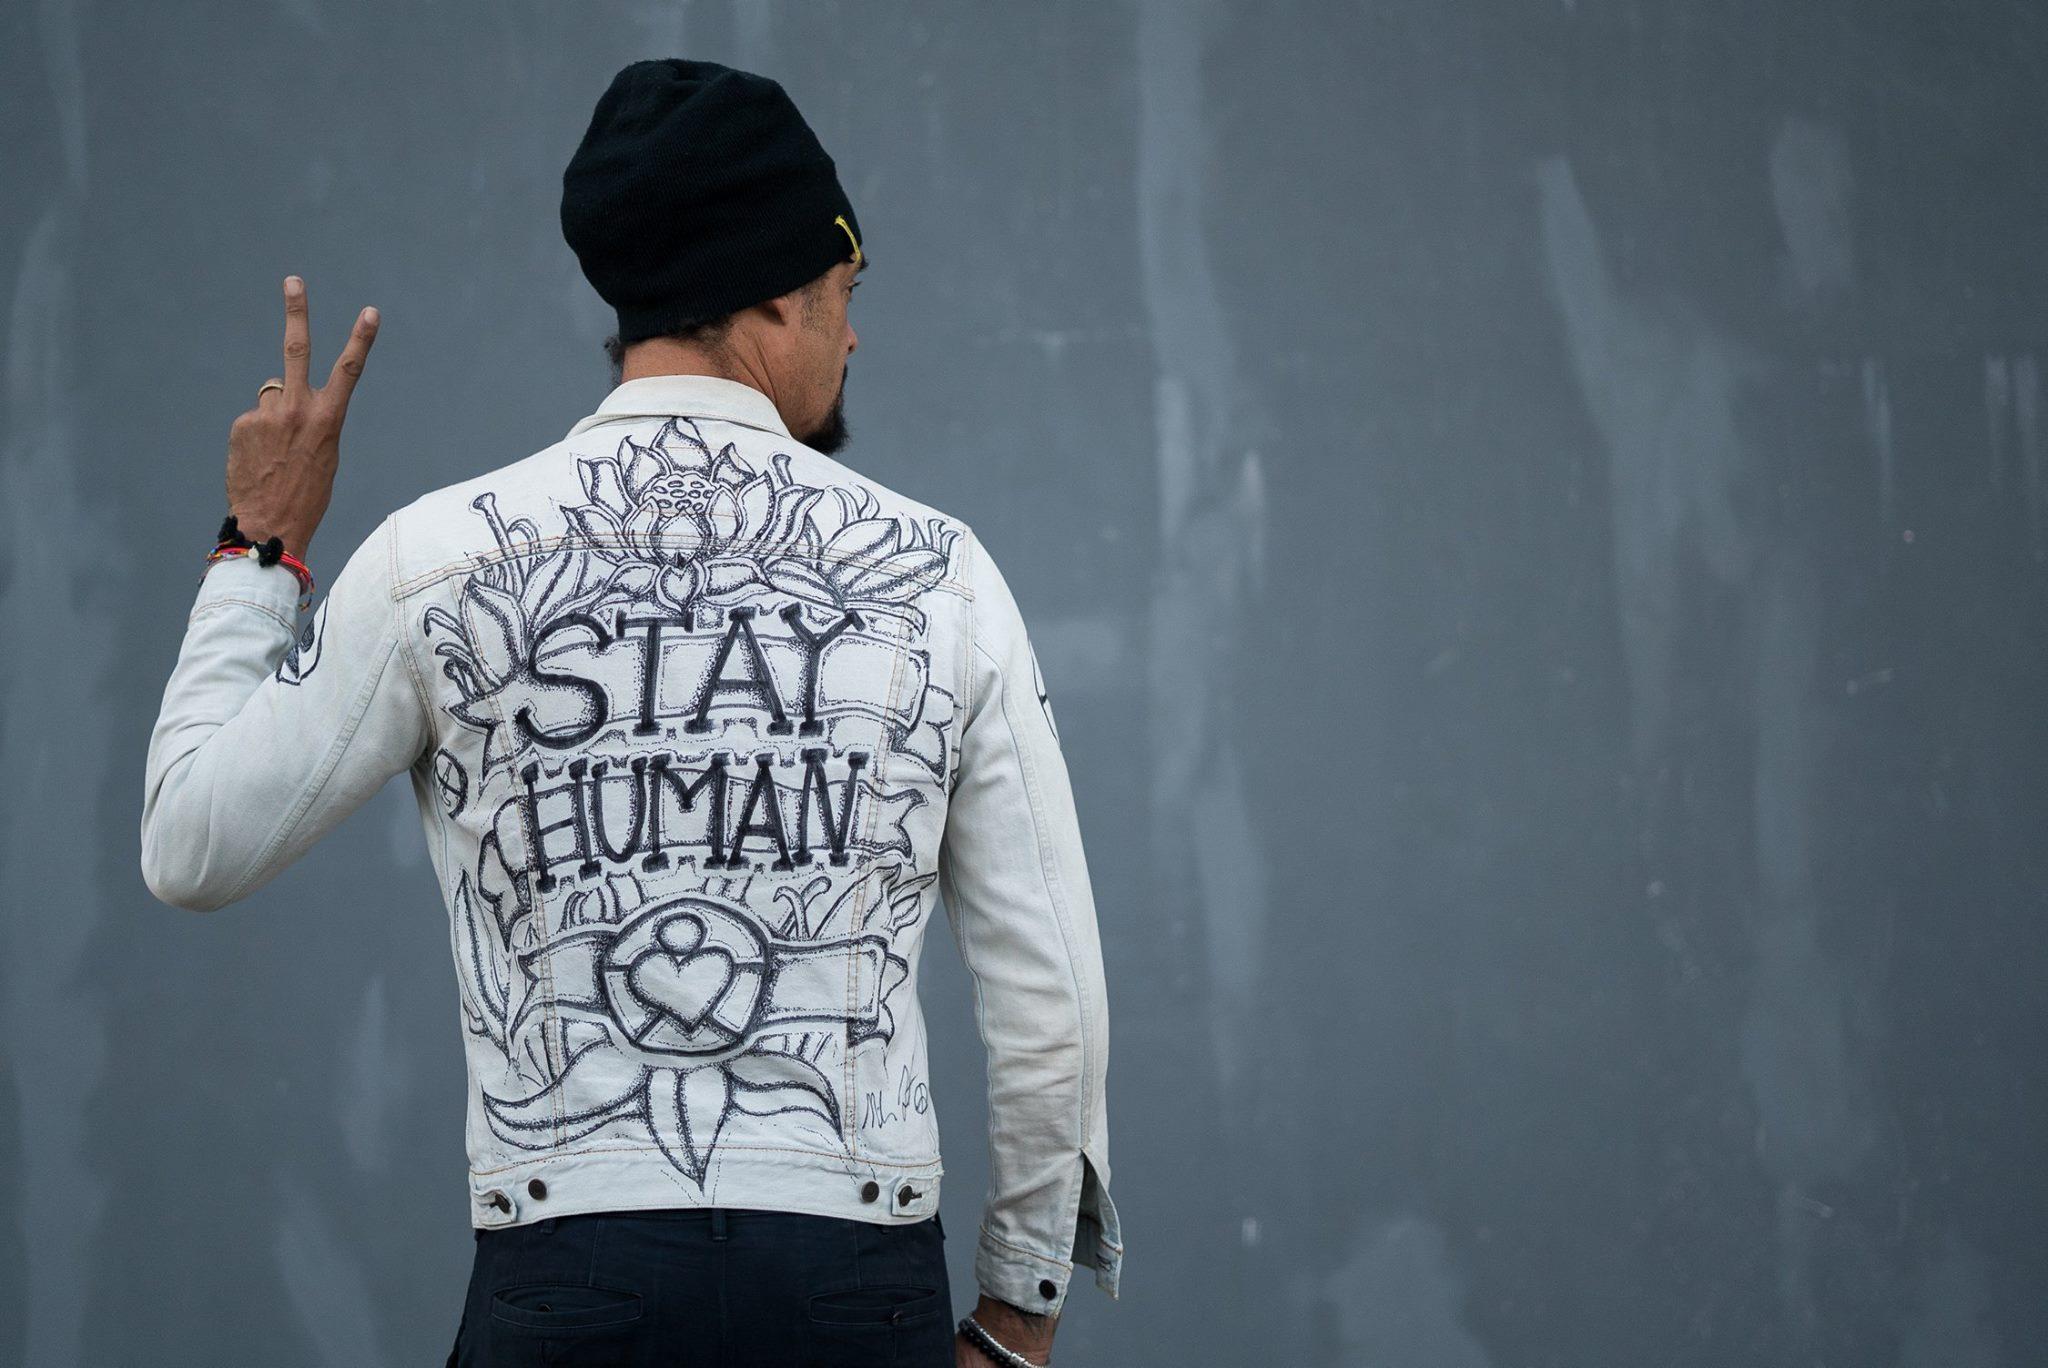 KEEP LIVING. STAY HUMAN.